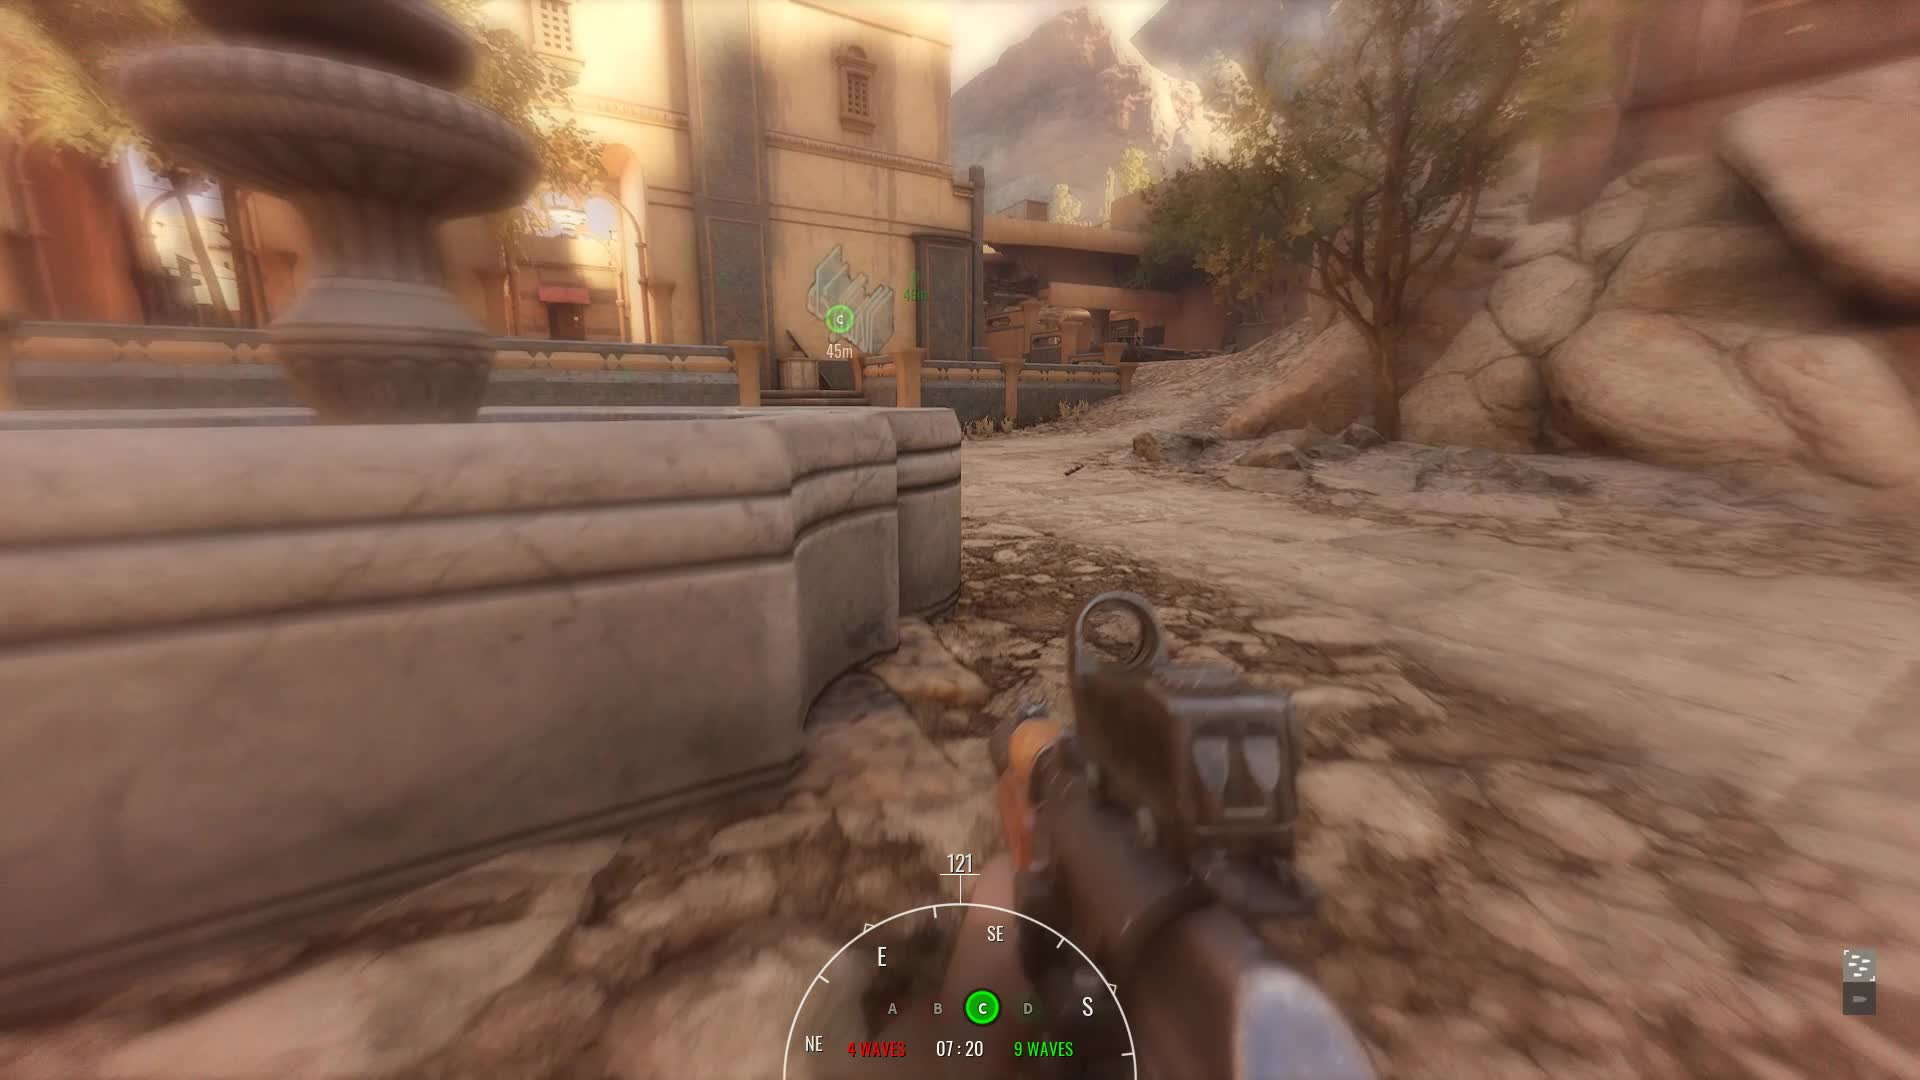 insurgency, sandstorm, c4 GIFs